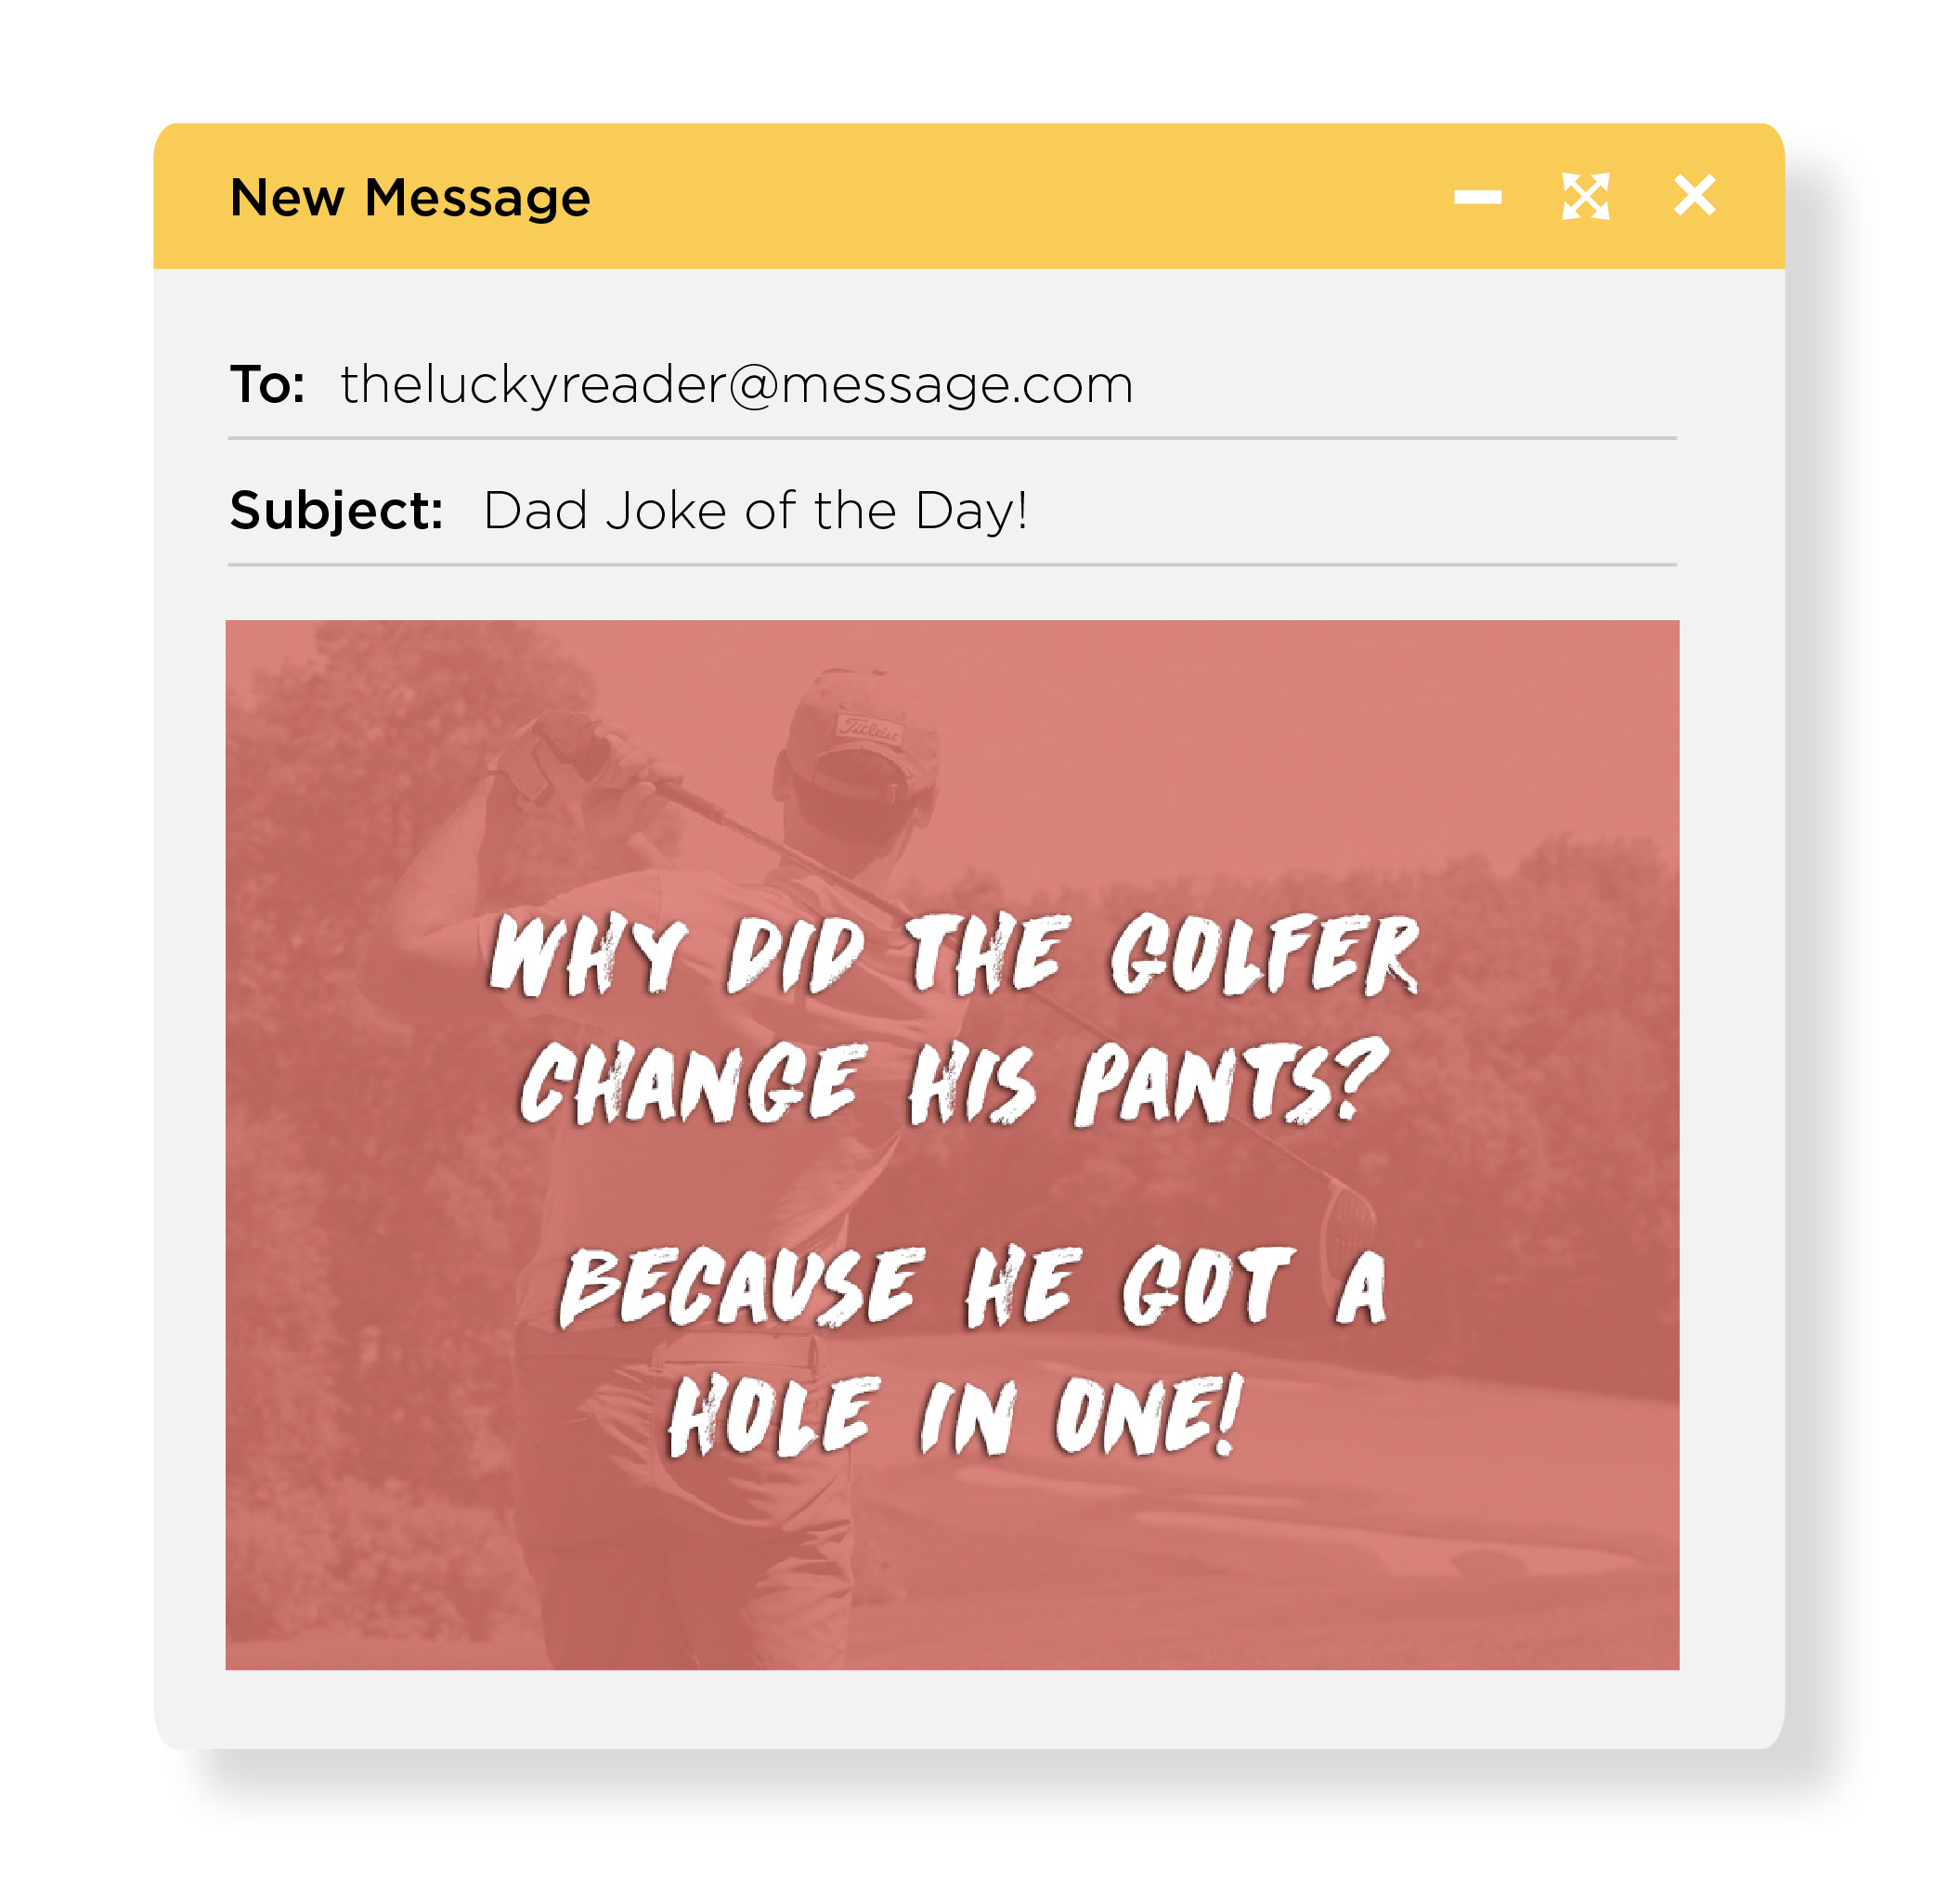 31 days of dad jokes, Dad jokes to your inbox